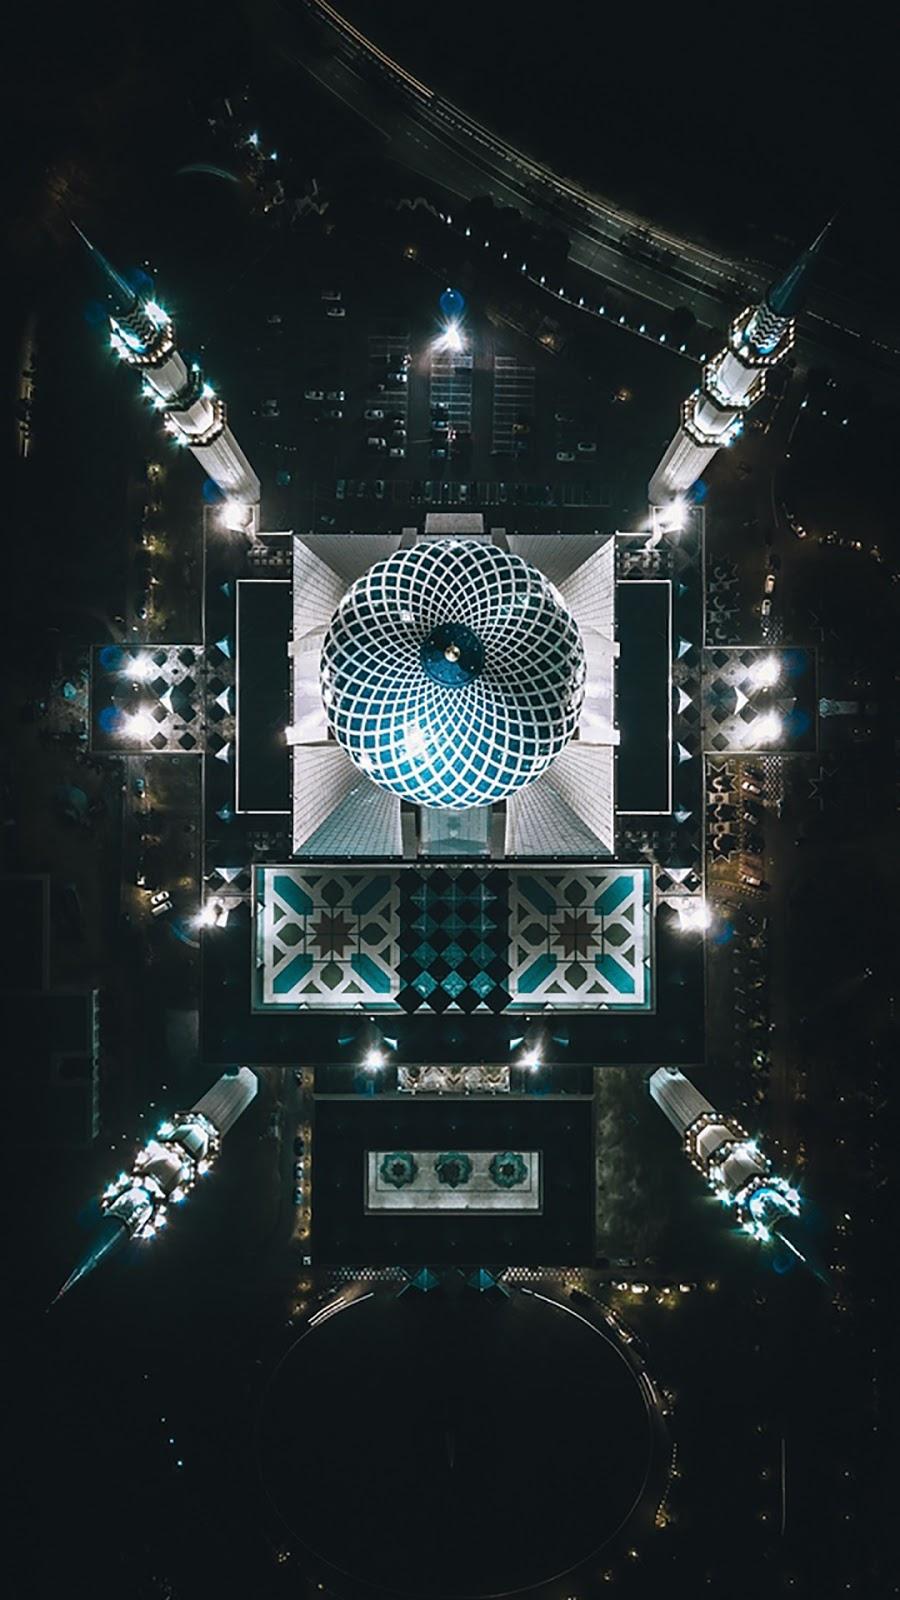 Wallpape Gambar ramadhan keren masjid keren dari atas